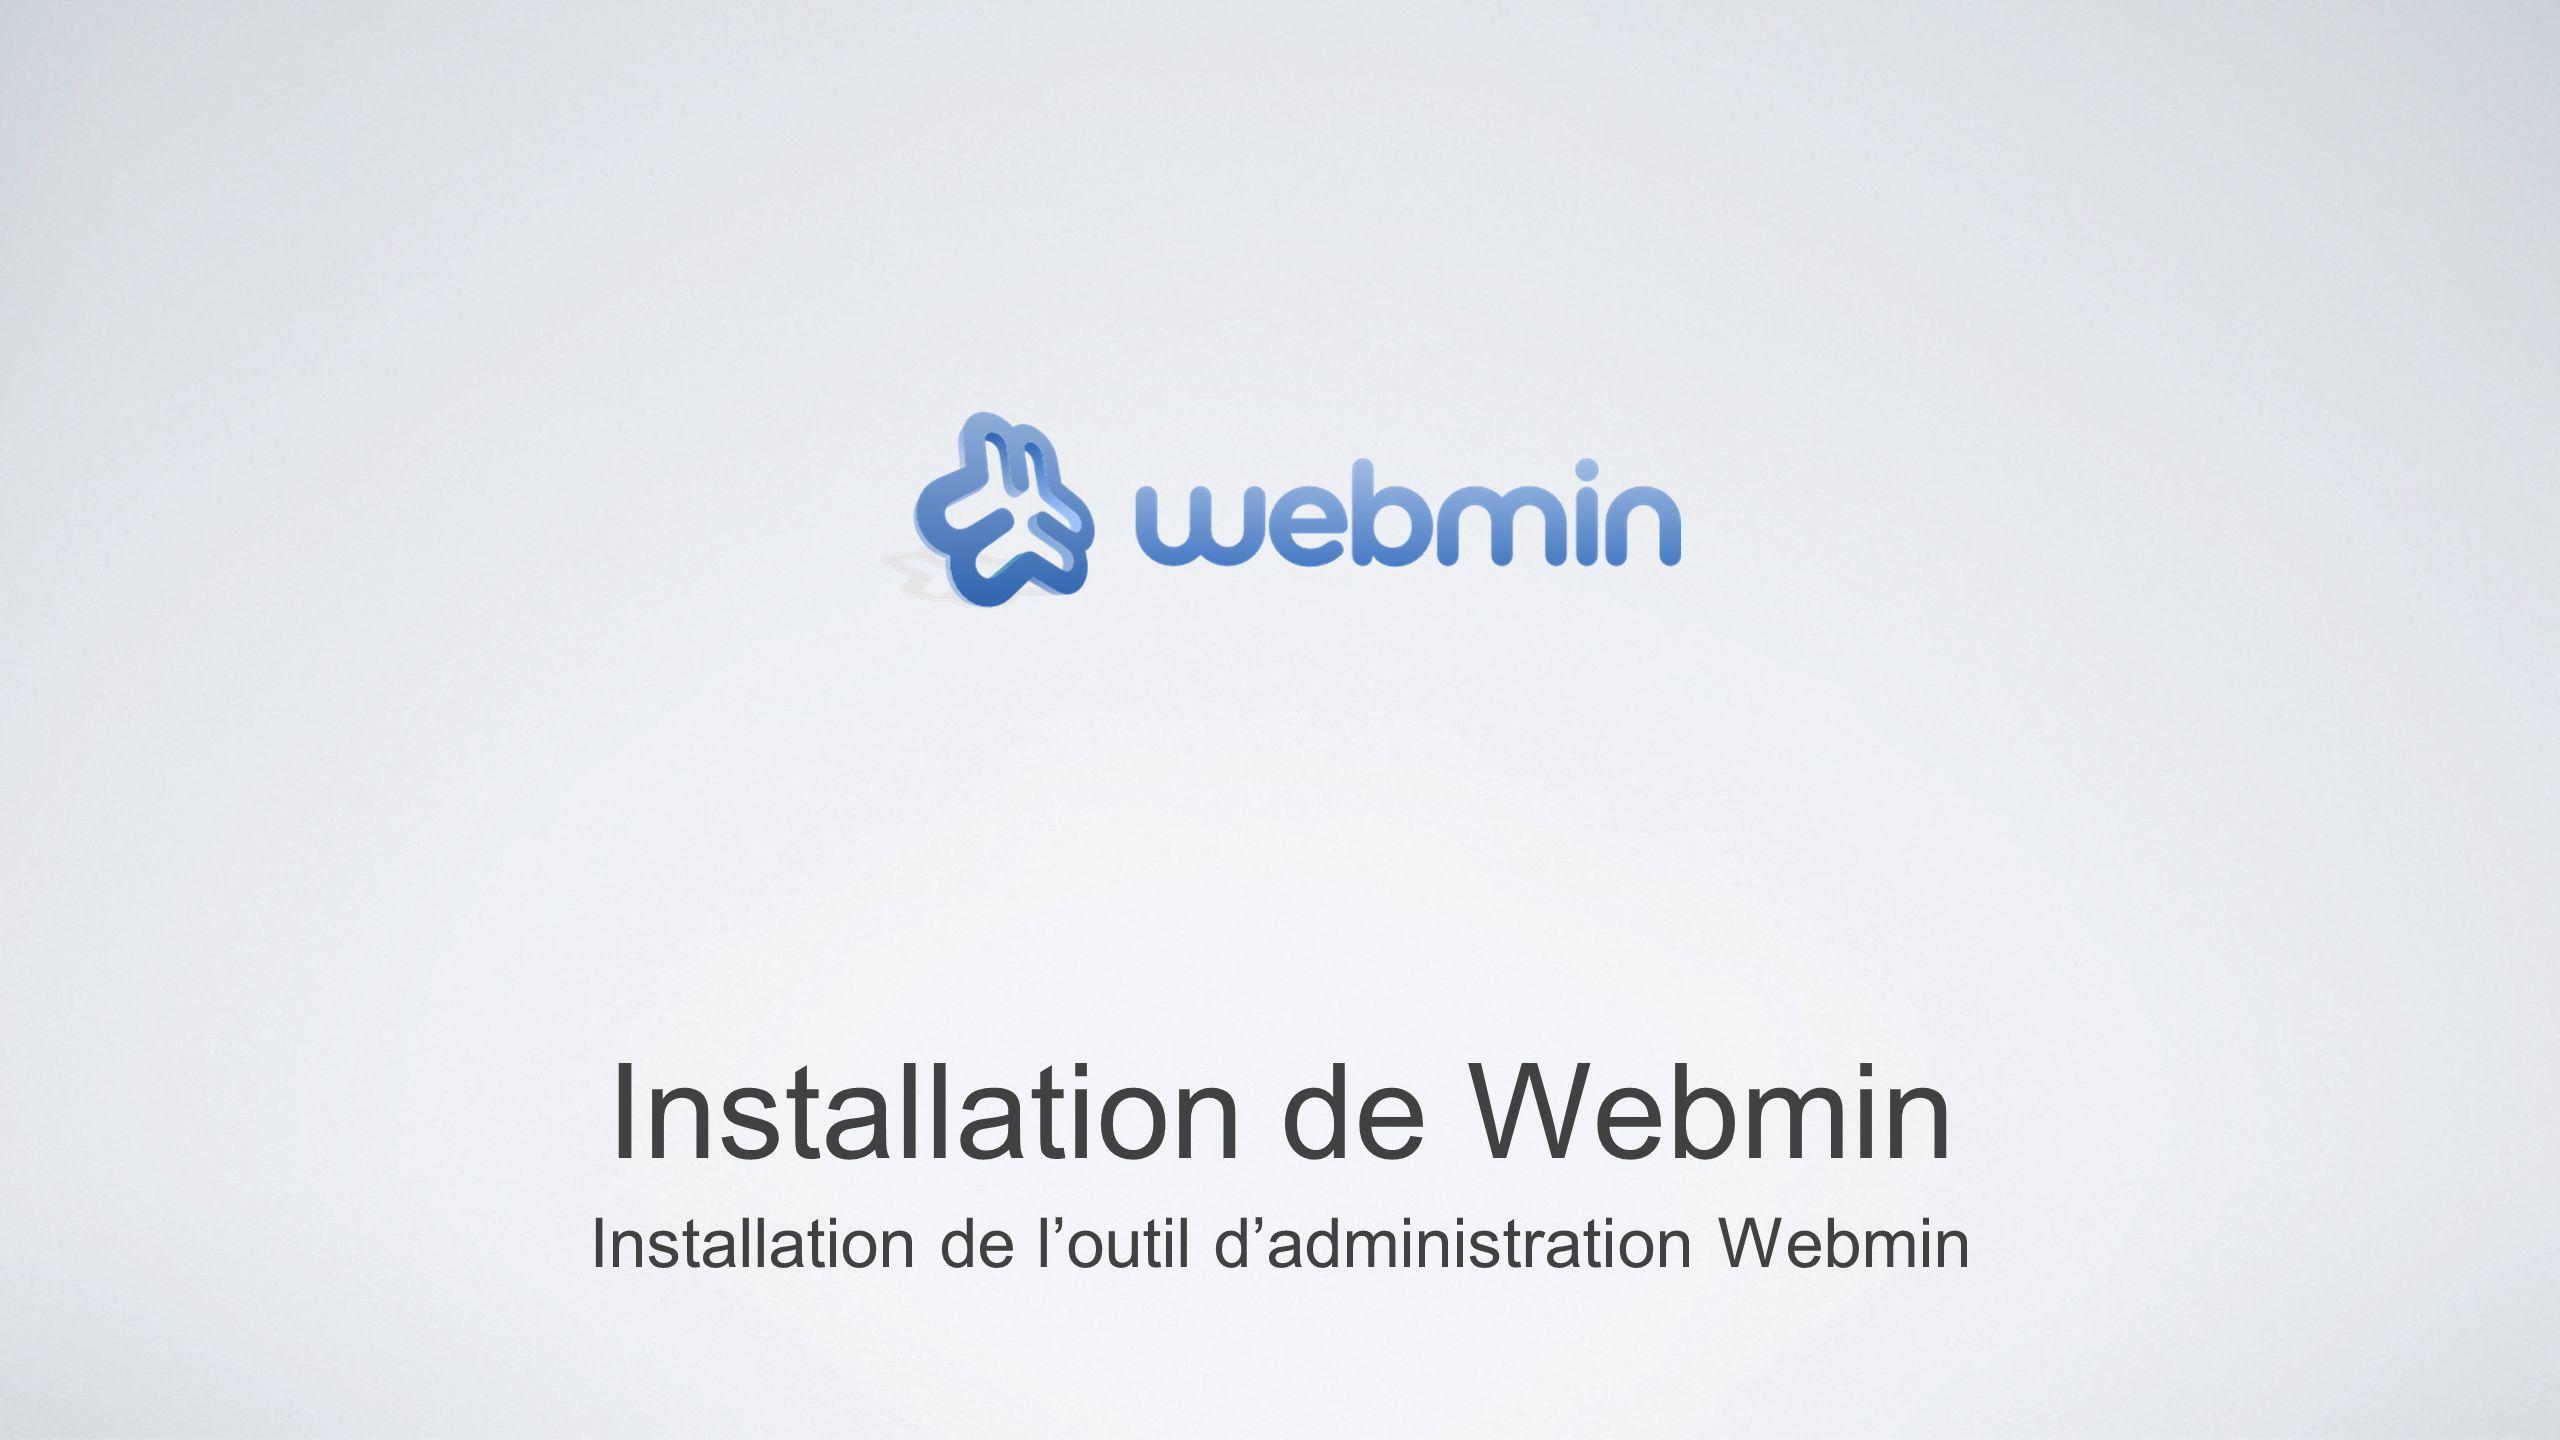 Installation de Webmin Installation de loutil dadministration Webmin